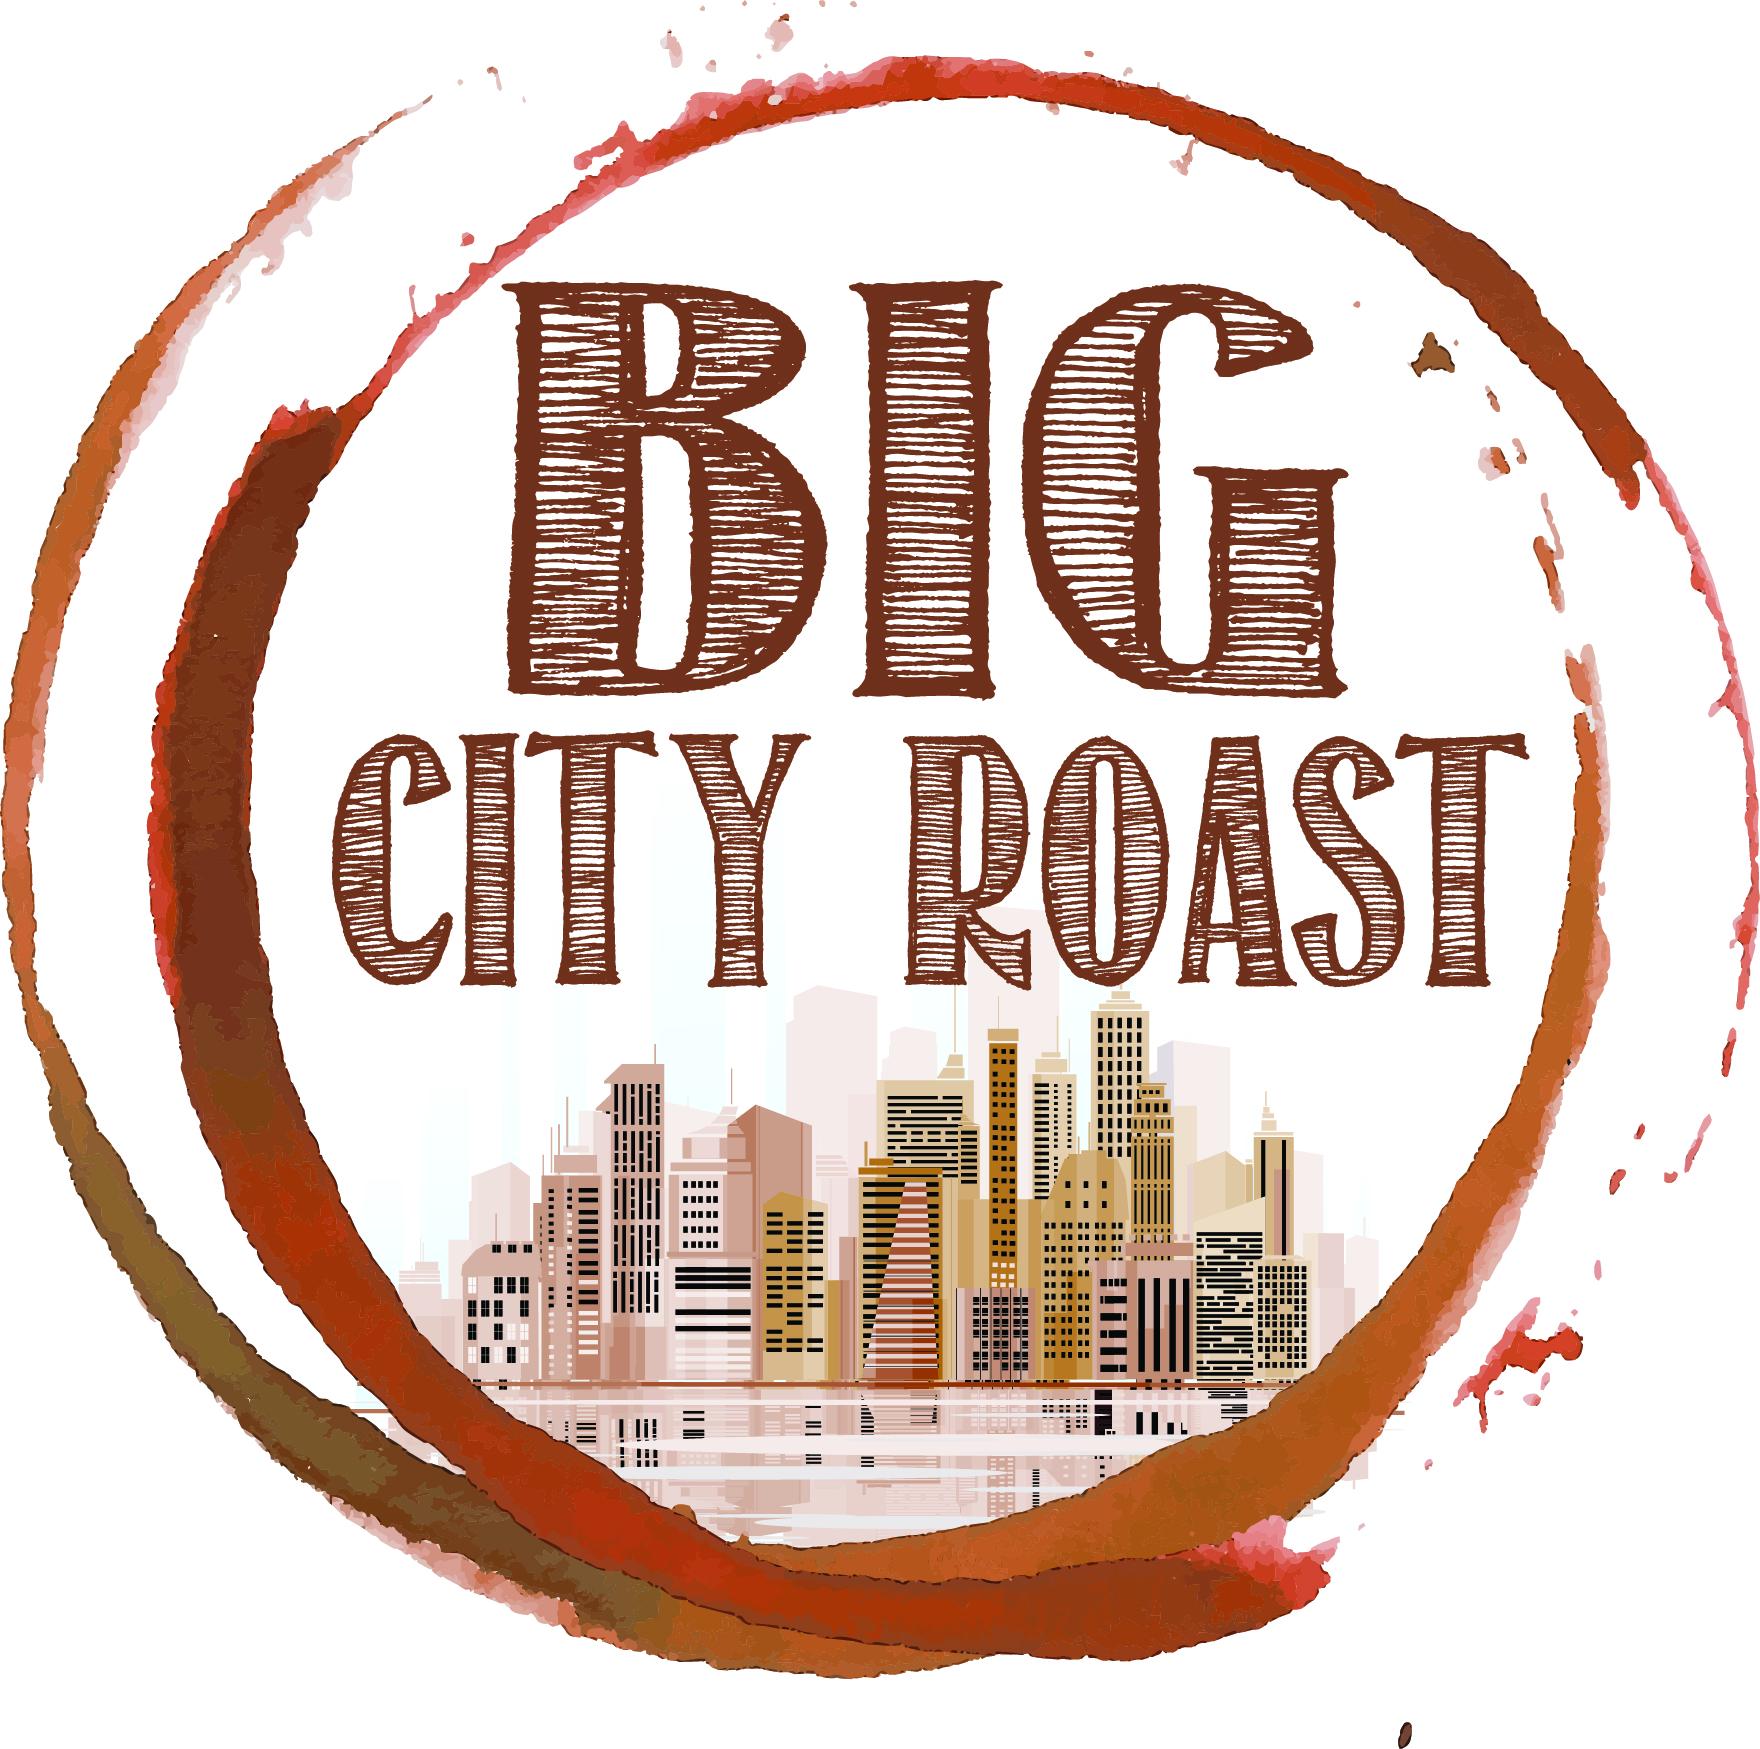 Big City Roast